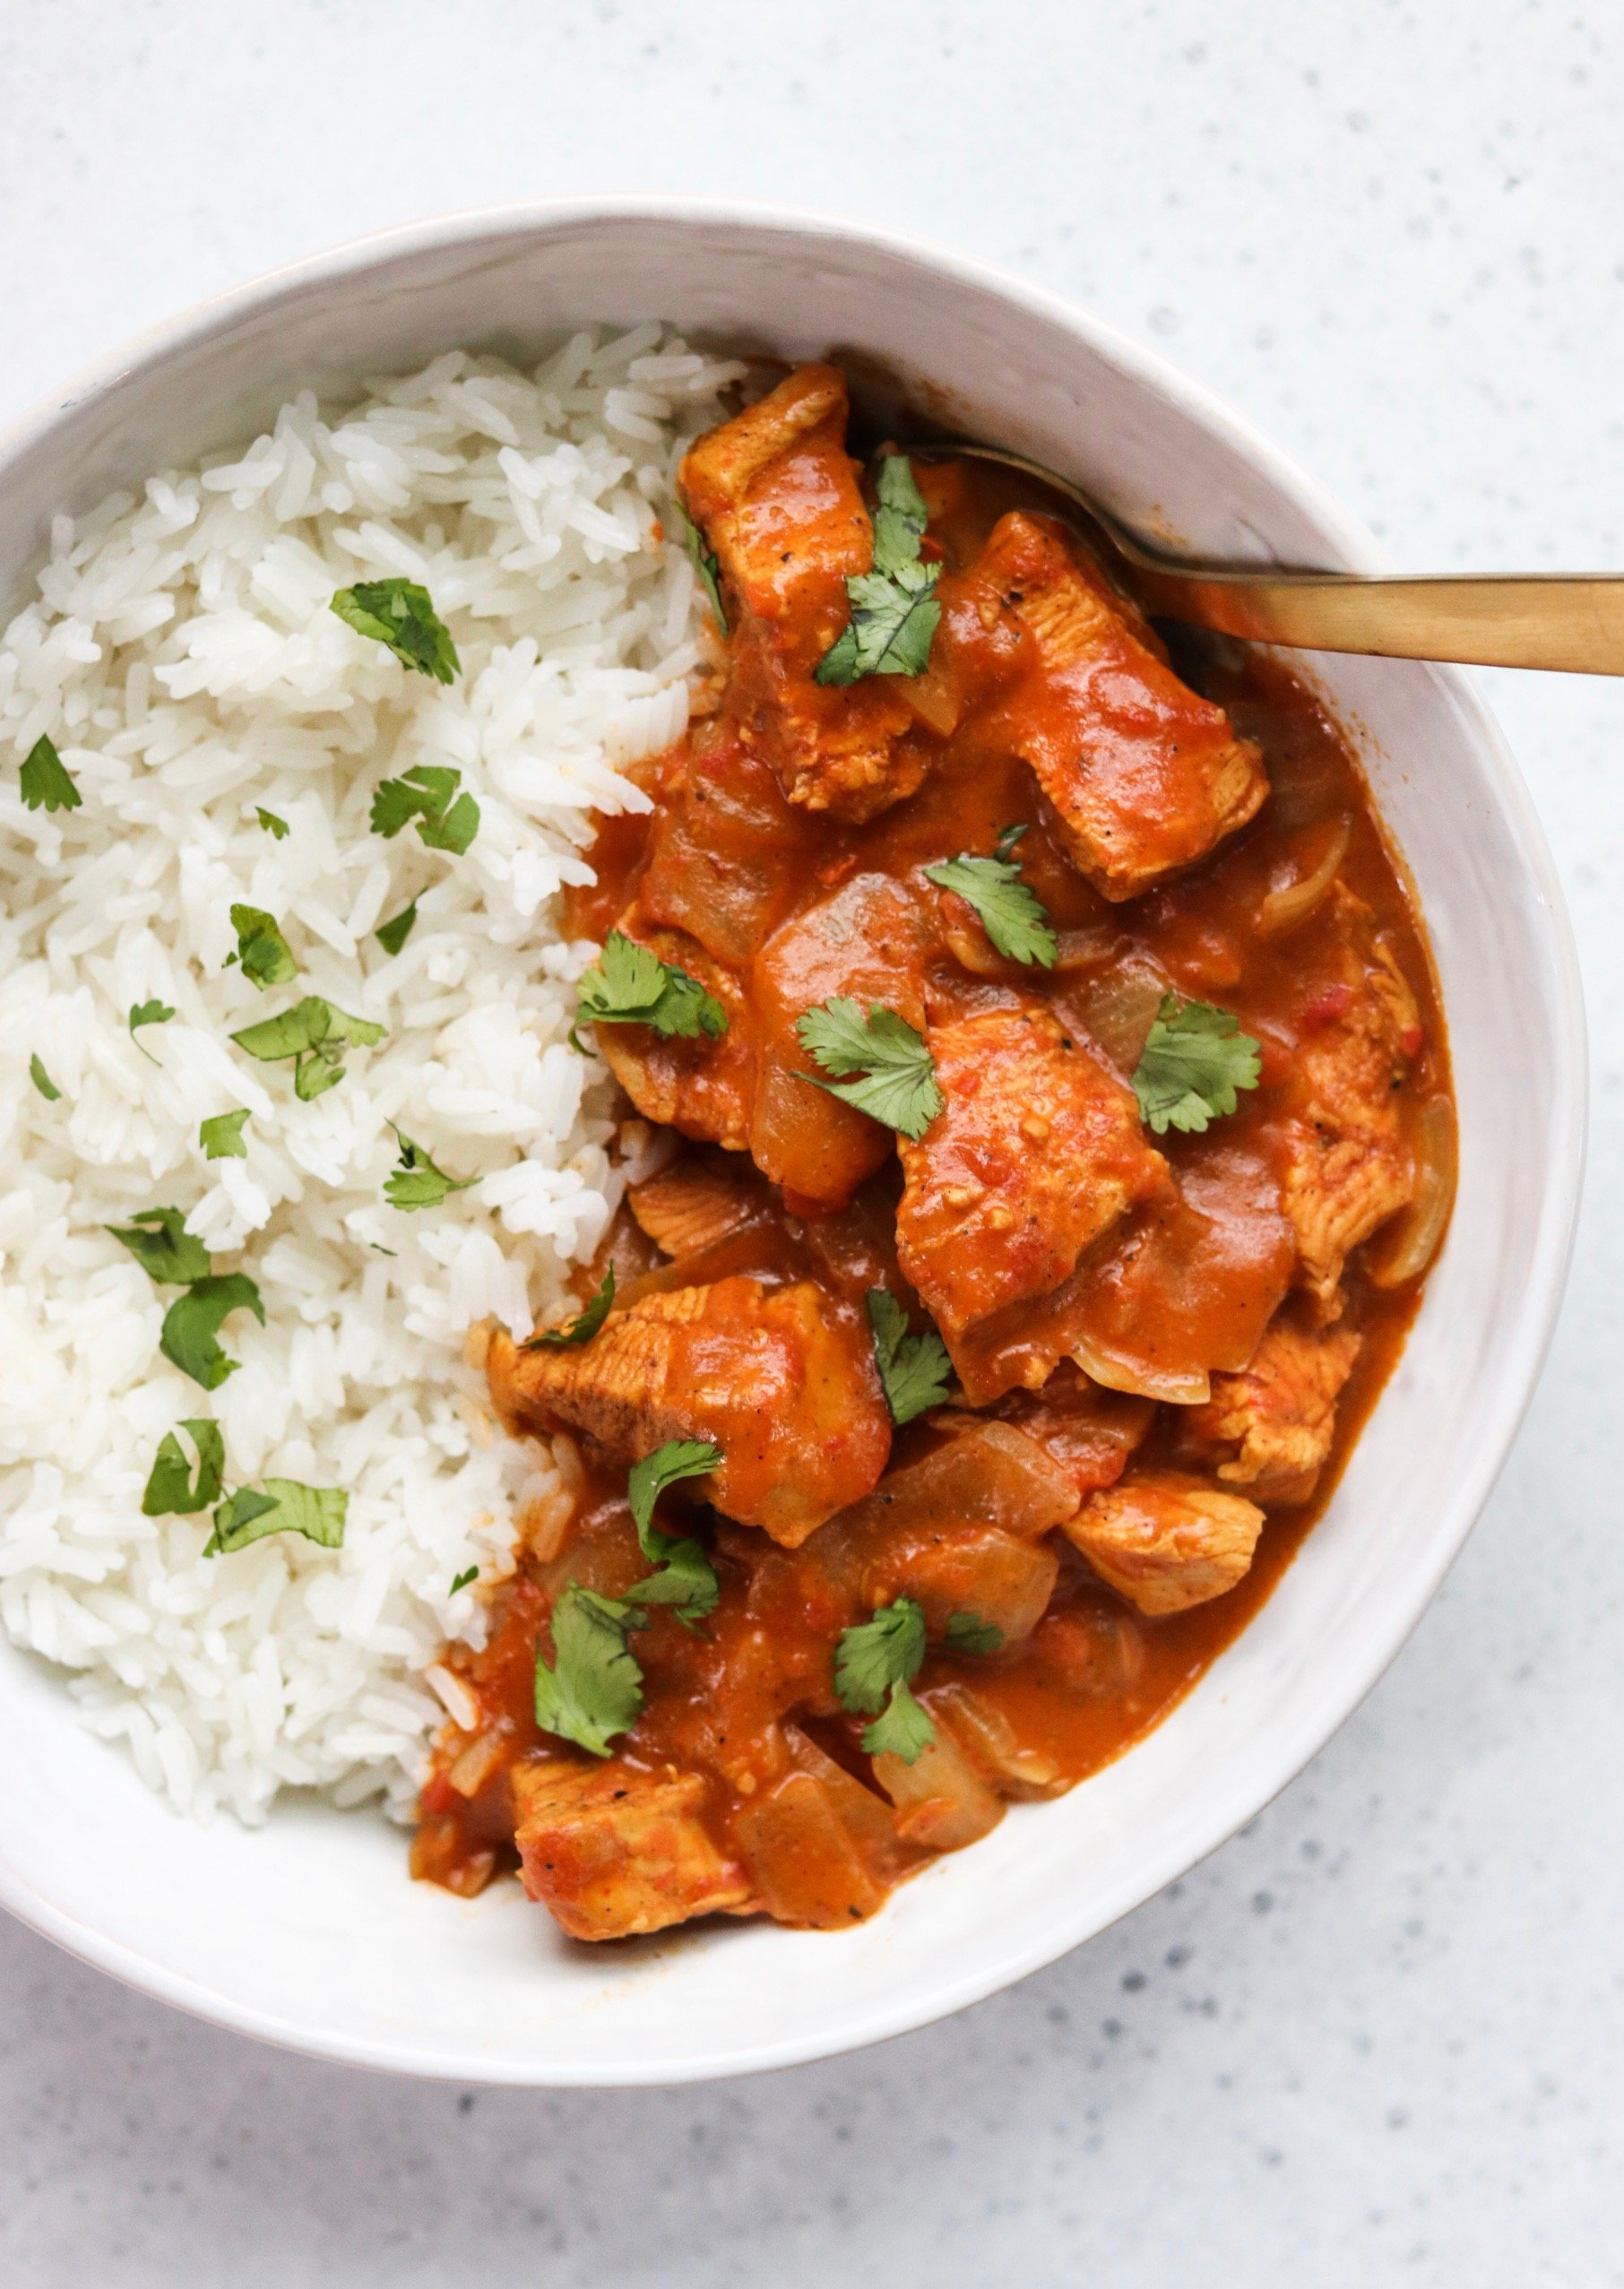 Instant Pot chicken tikka masala with rice - gluten free